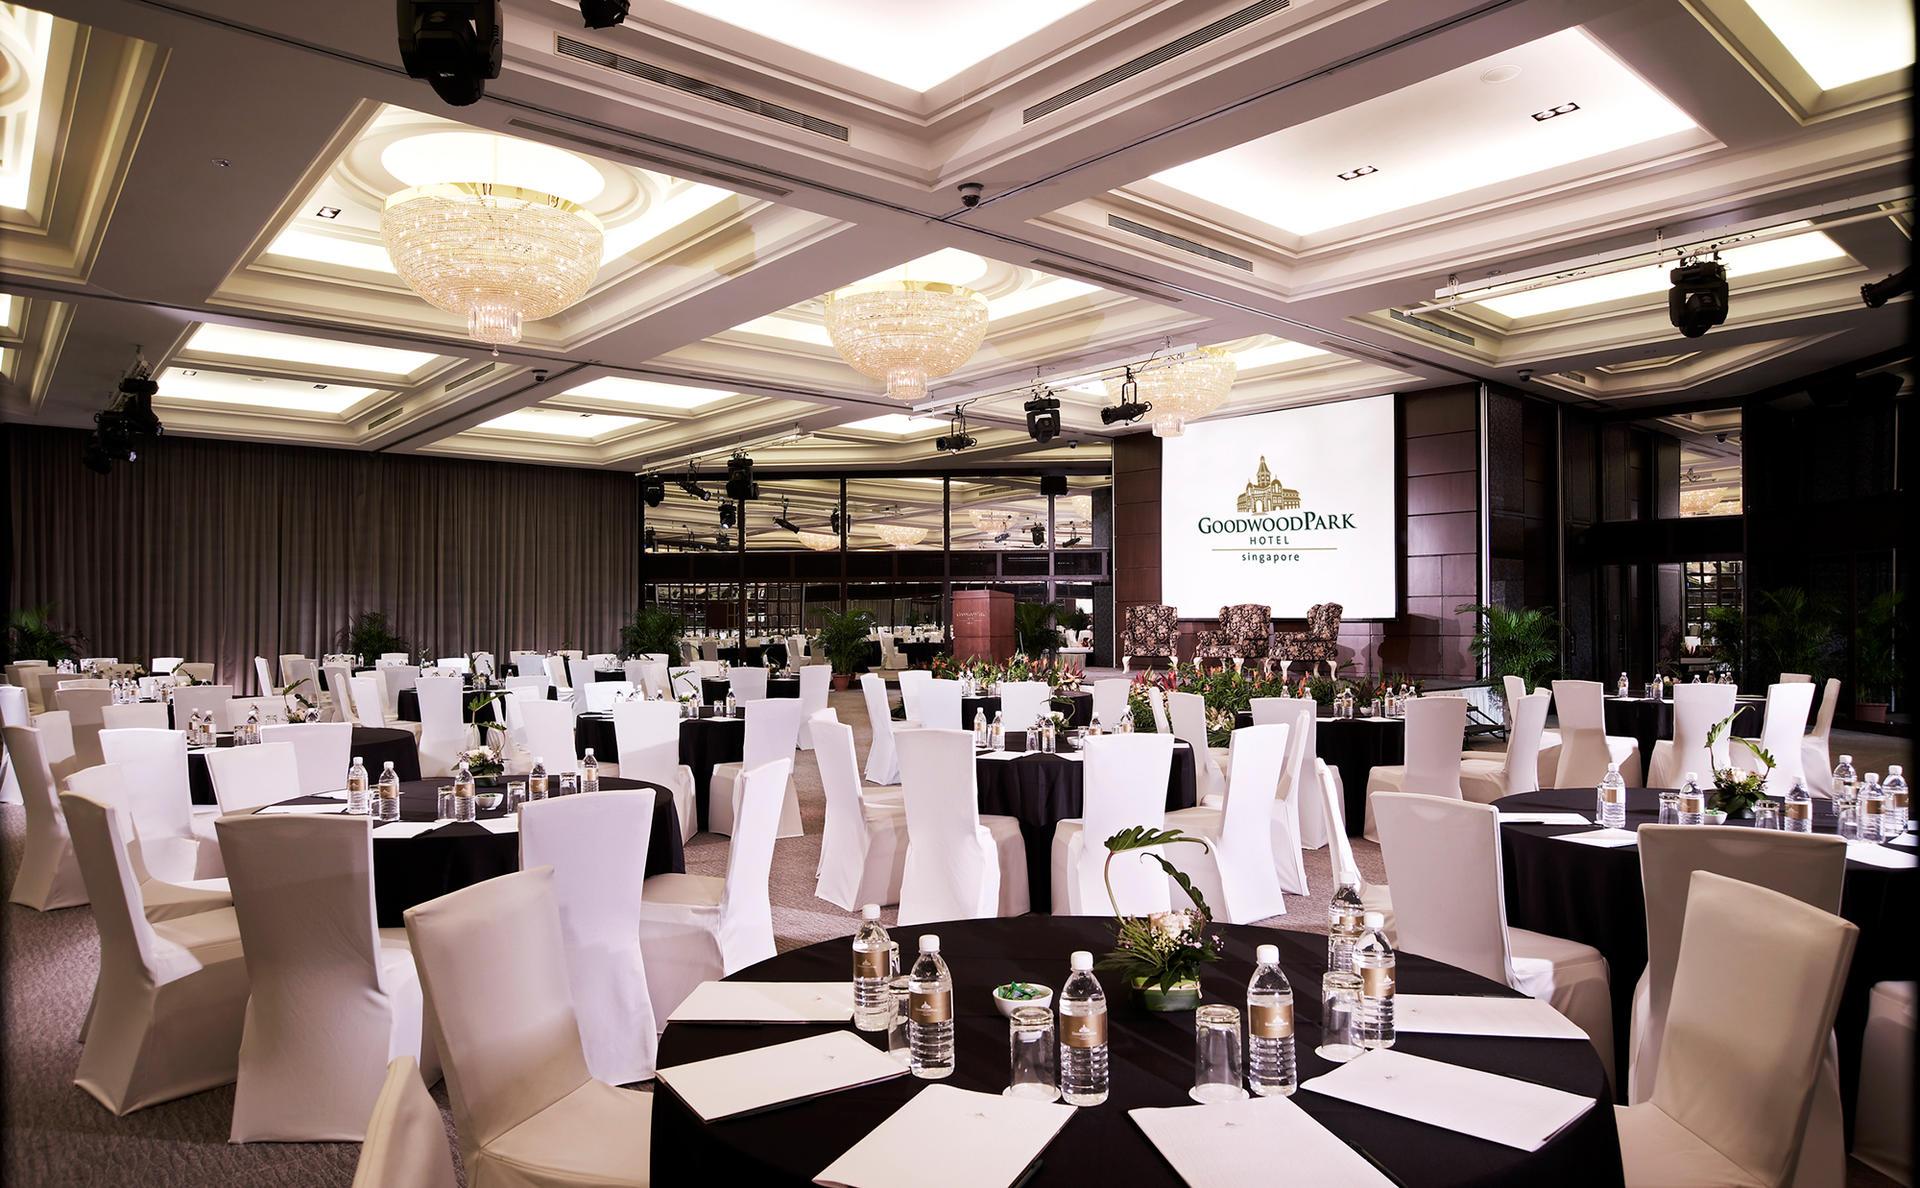 Windsort Ballroom at Goodwood Park Hotel Singapore